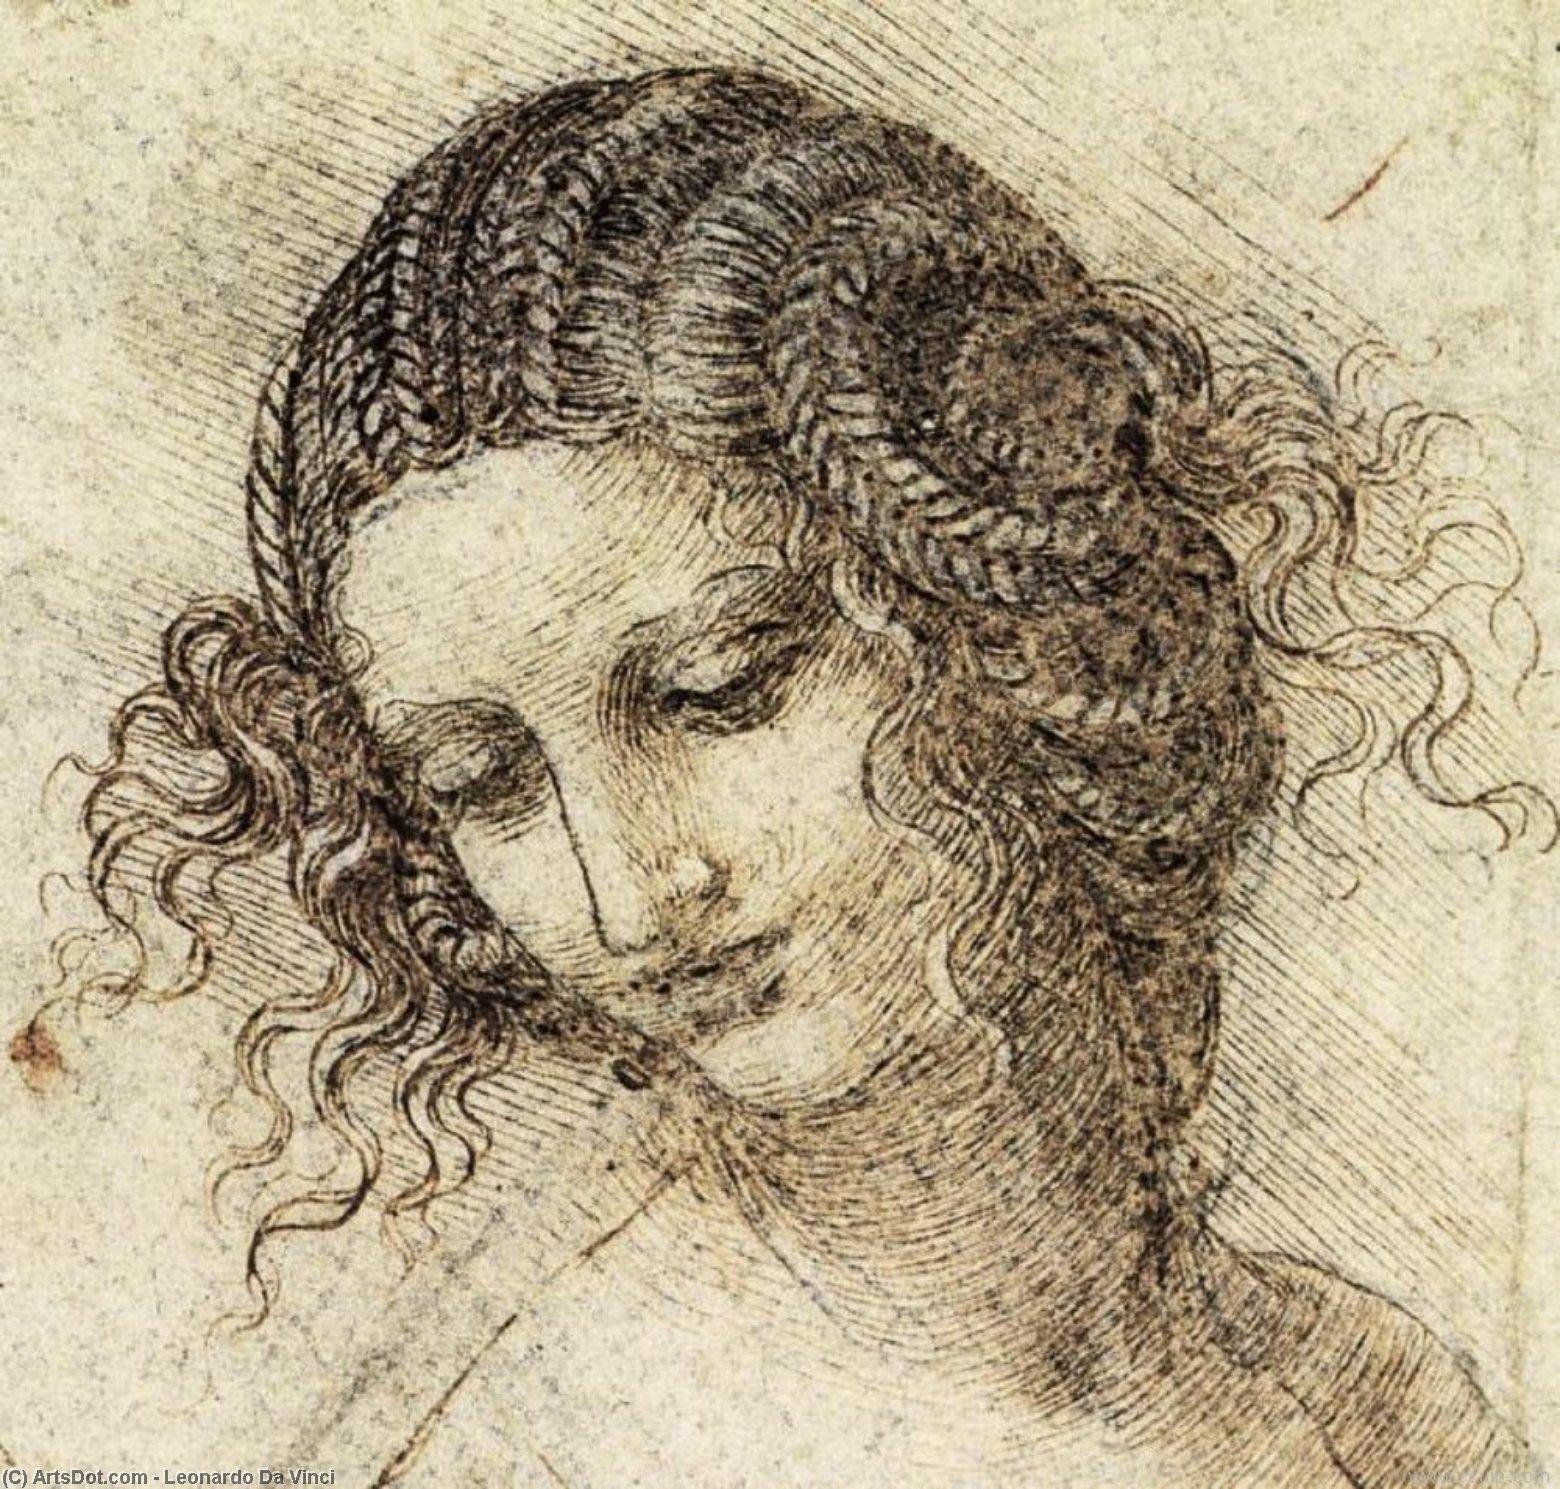 Wikioo.org - The Encyclopedia of Fine Arts - Painting, Artwork by Leonardo Da Vinci - Study for the Head of Leda